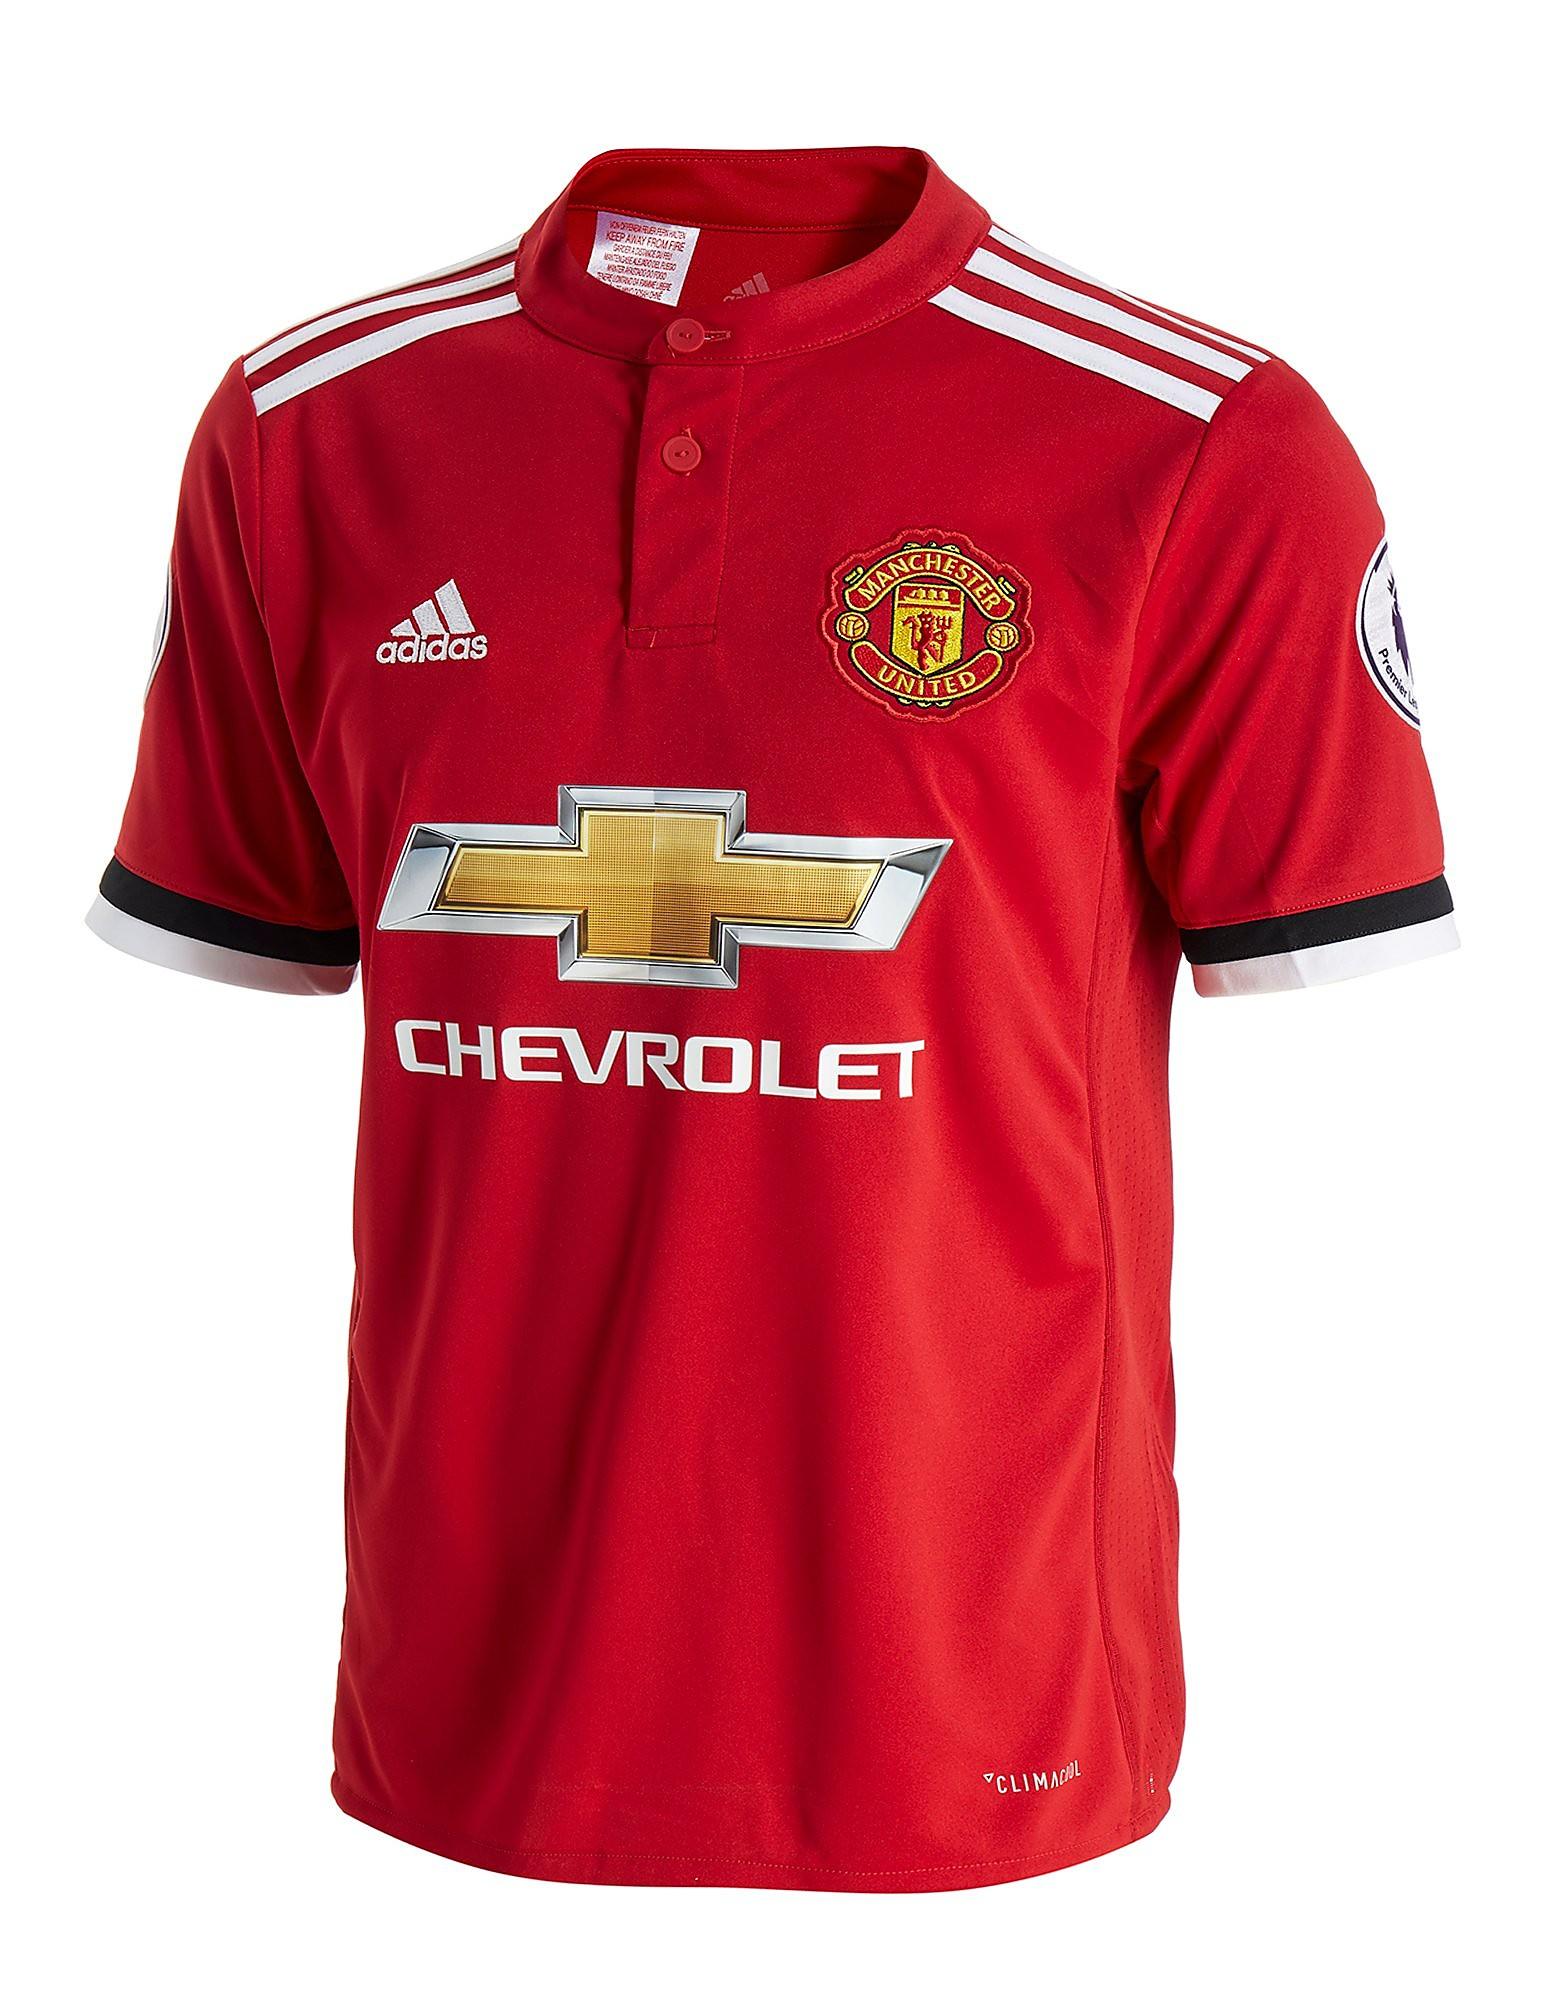 adidas camiseta 1.ª equipación Manchester United Rashford 2017/18 júnior